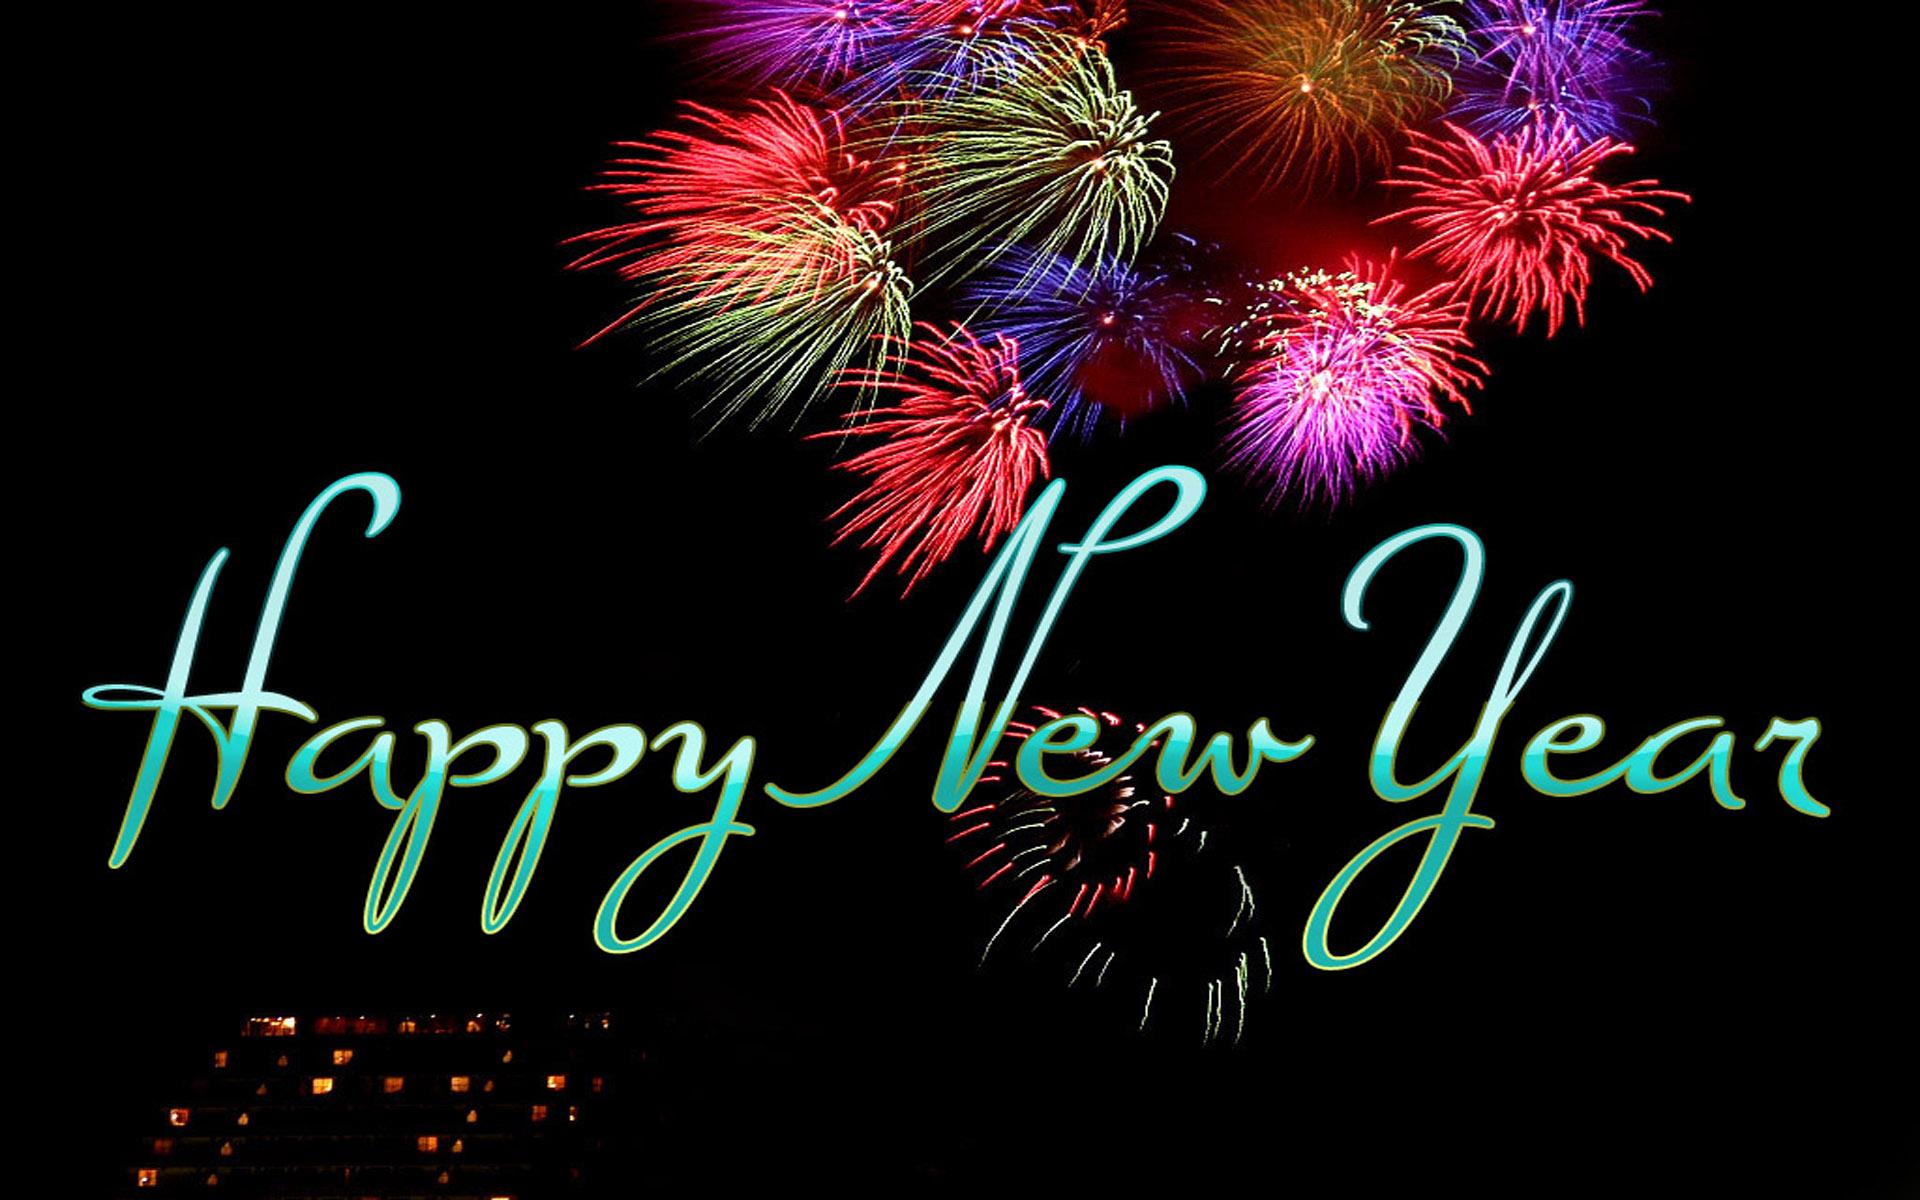 fractal best new year hd wallpaper